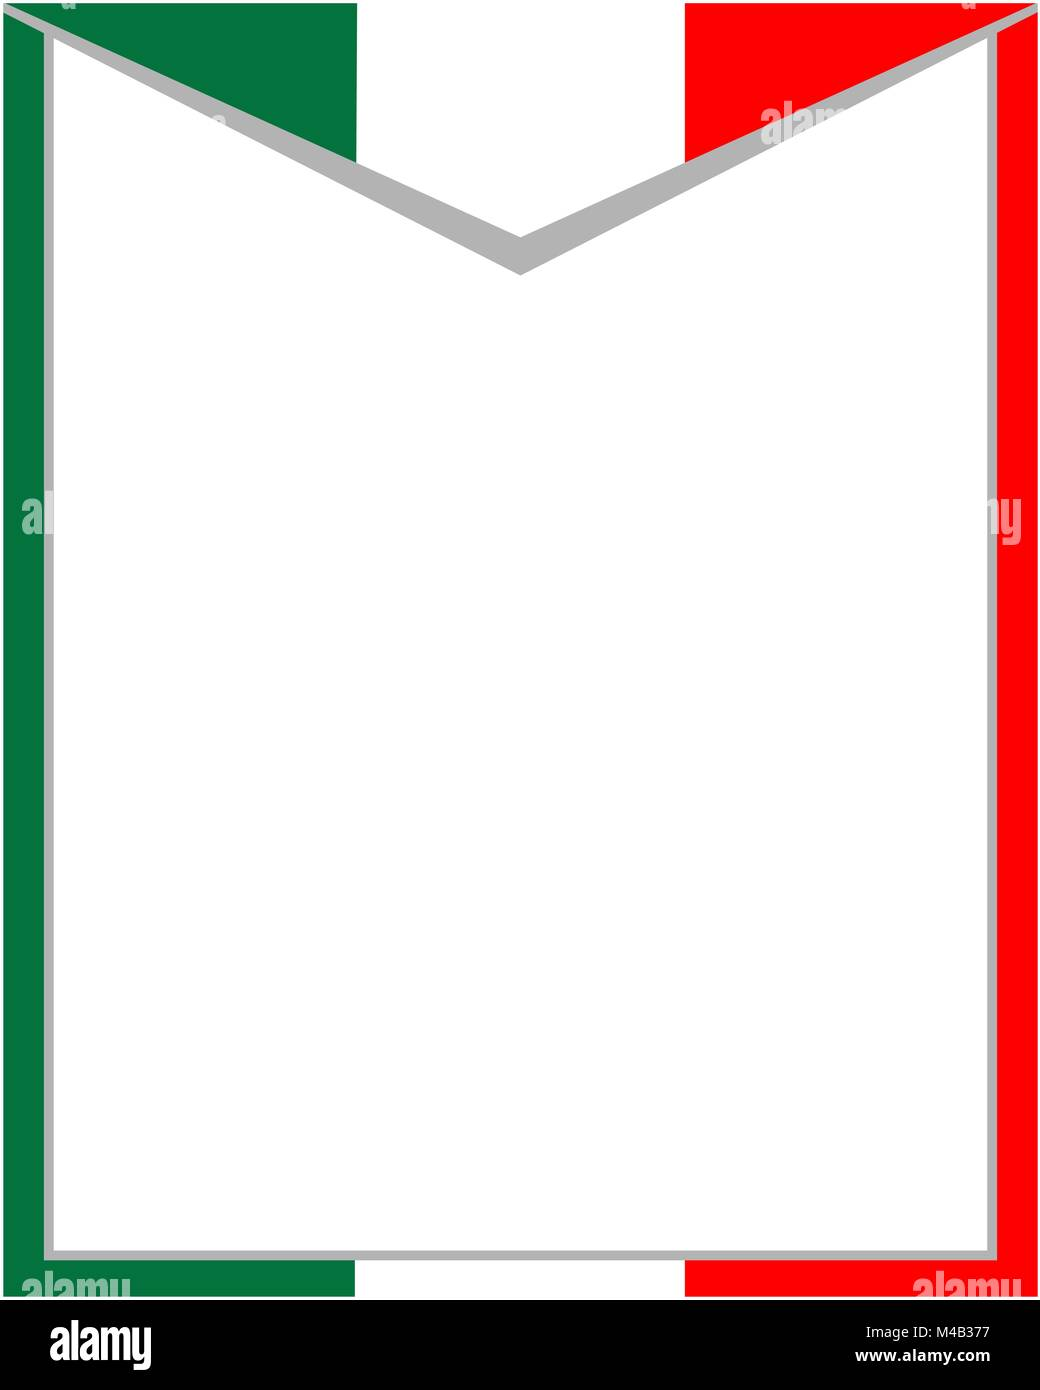 Italian Flag Abstract Stockfotos & Italian Flag Abstract Bilder - Alamy